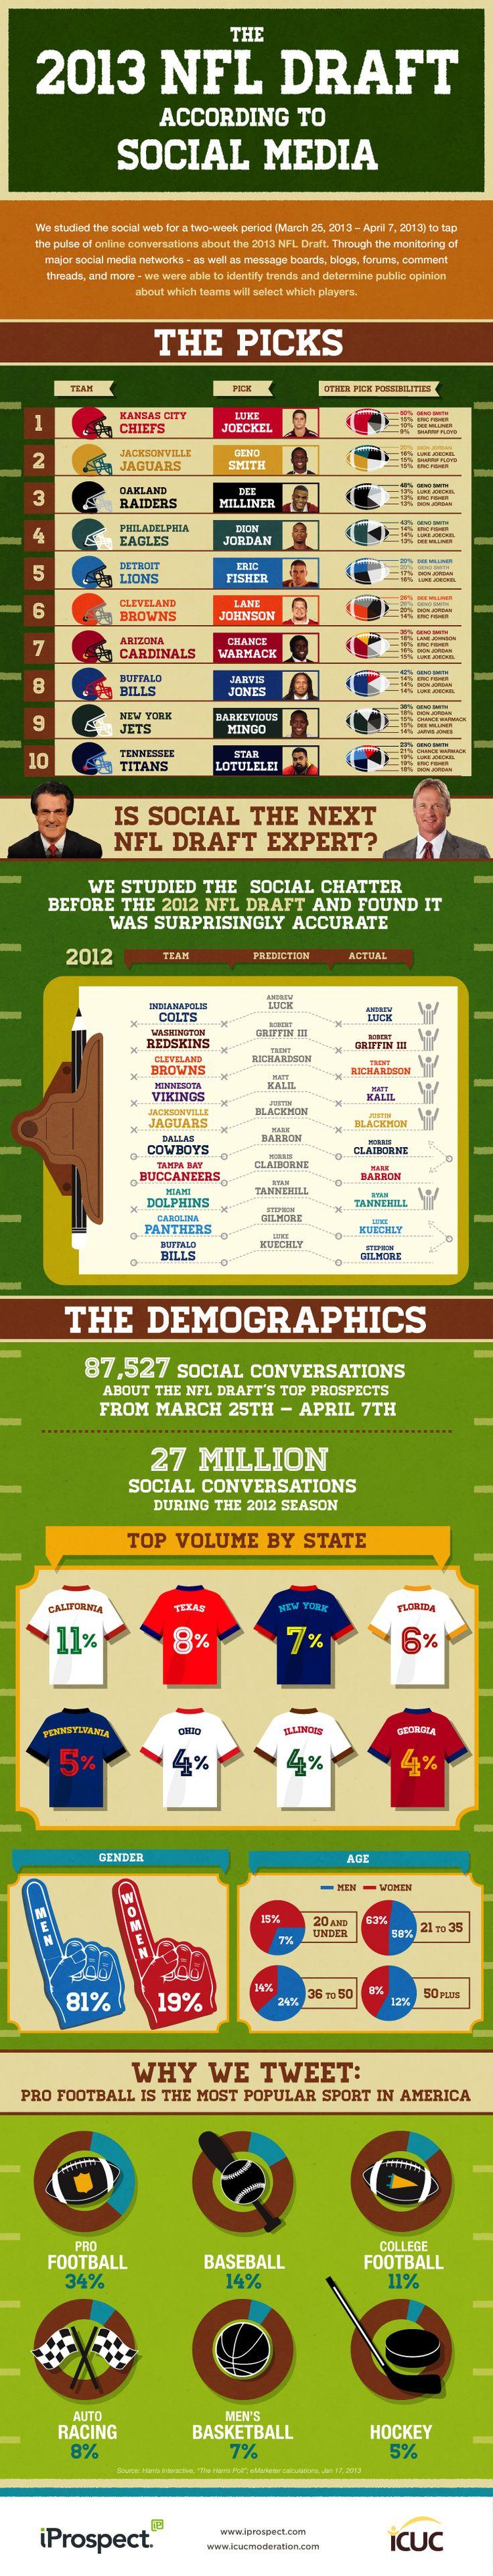 The 2013 NFL Draft According To Social Media [INFOGRAPHIC] #NFL #socialmedia